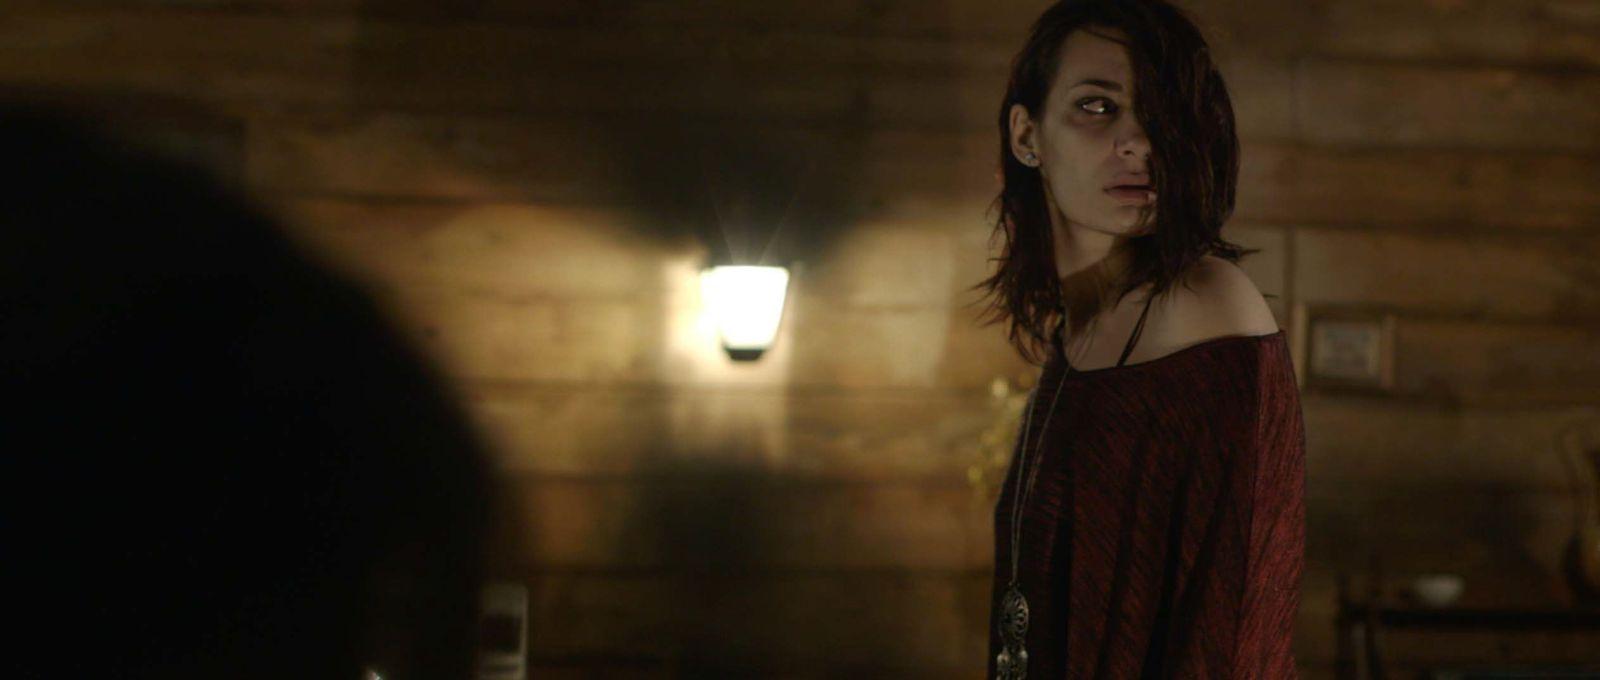 Hybris: Claudia Genolini in una scena del film